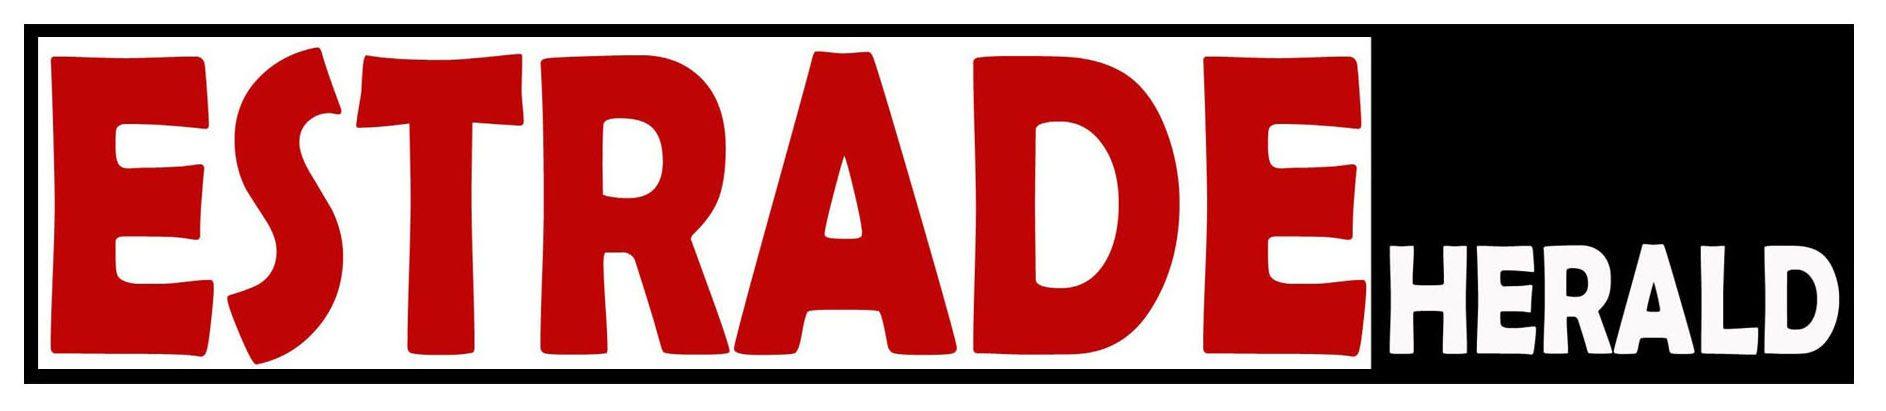 Estrade Herald